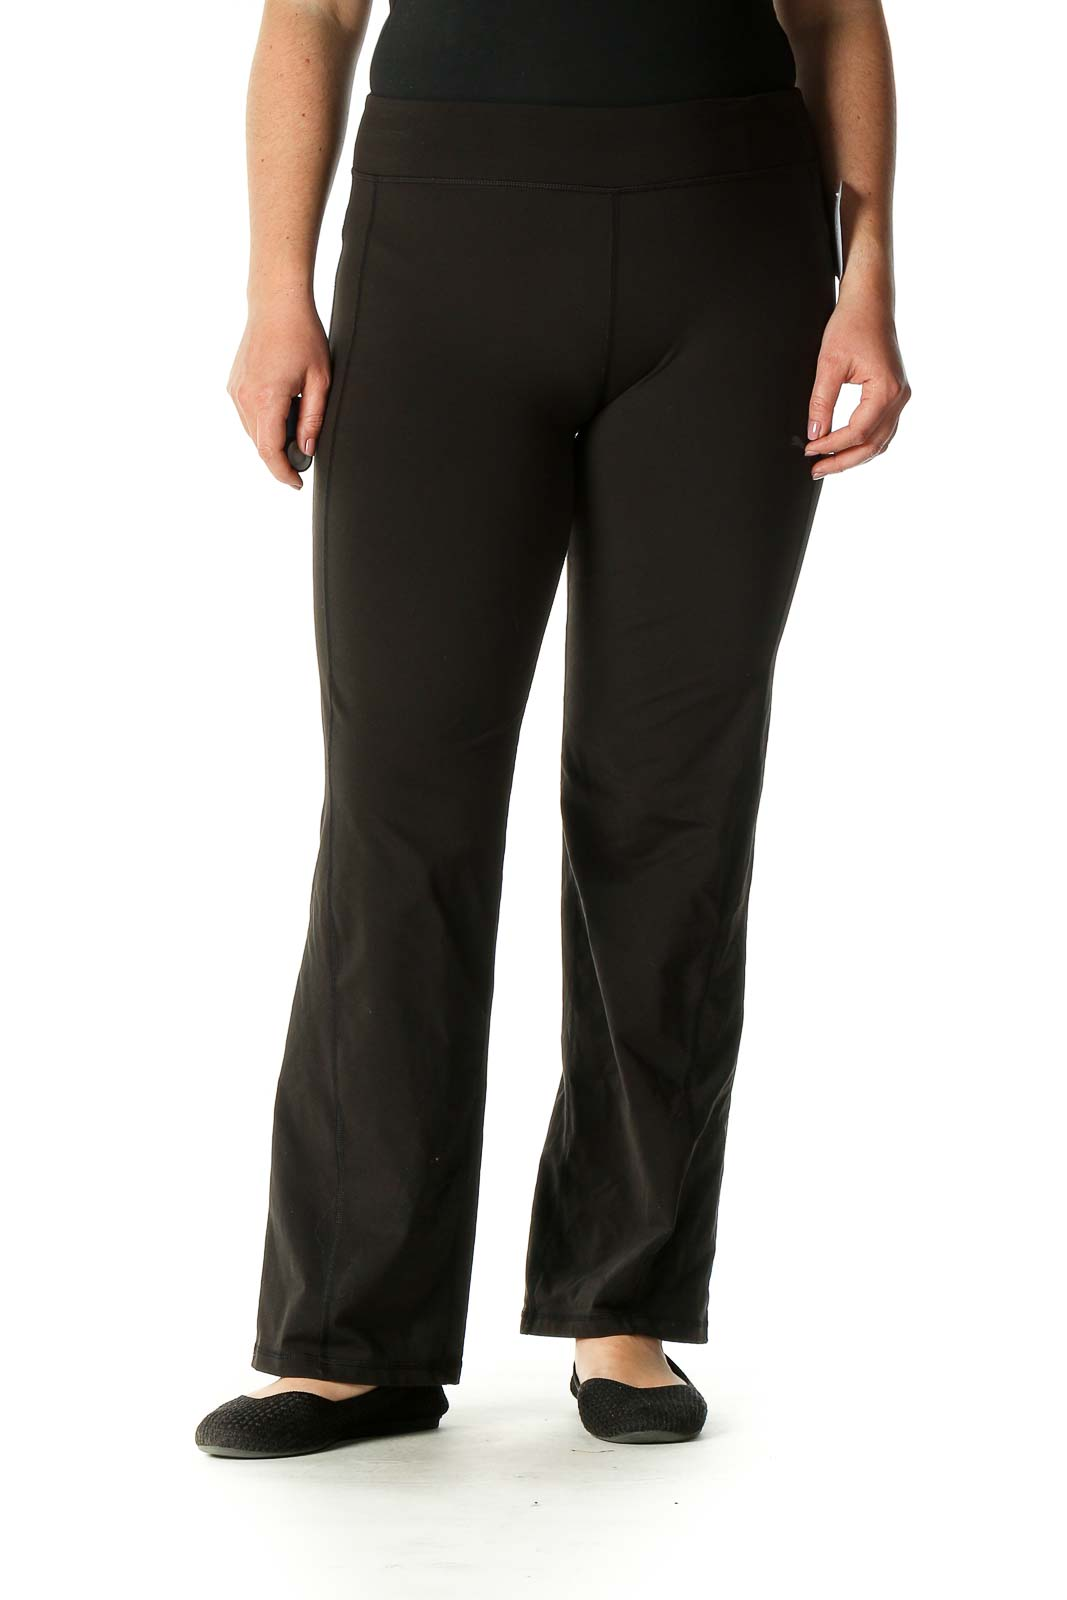 Black Solid Active Pants Front